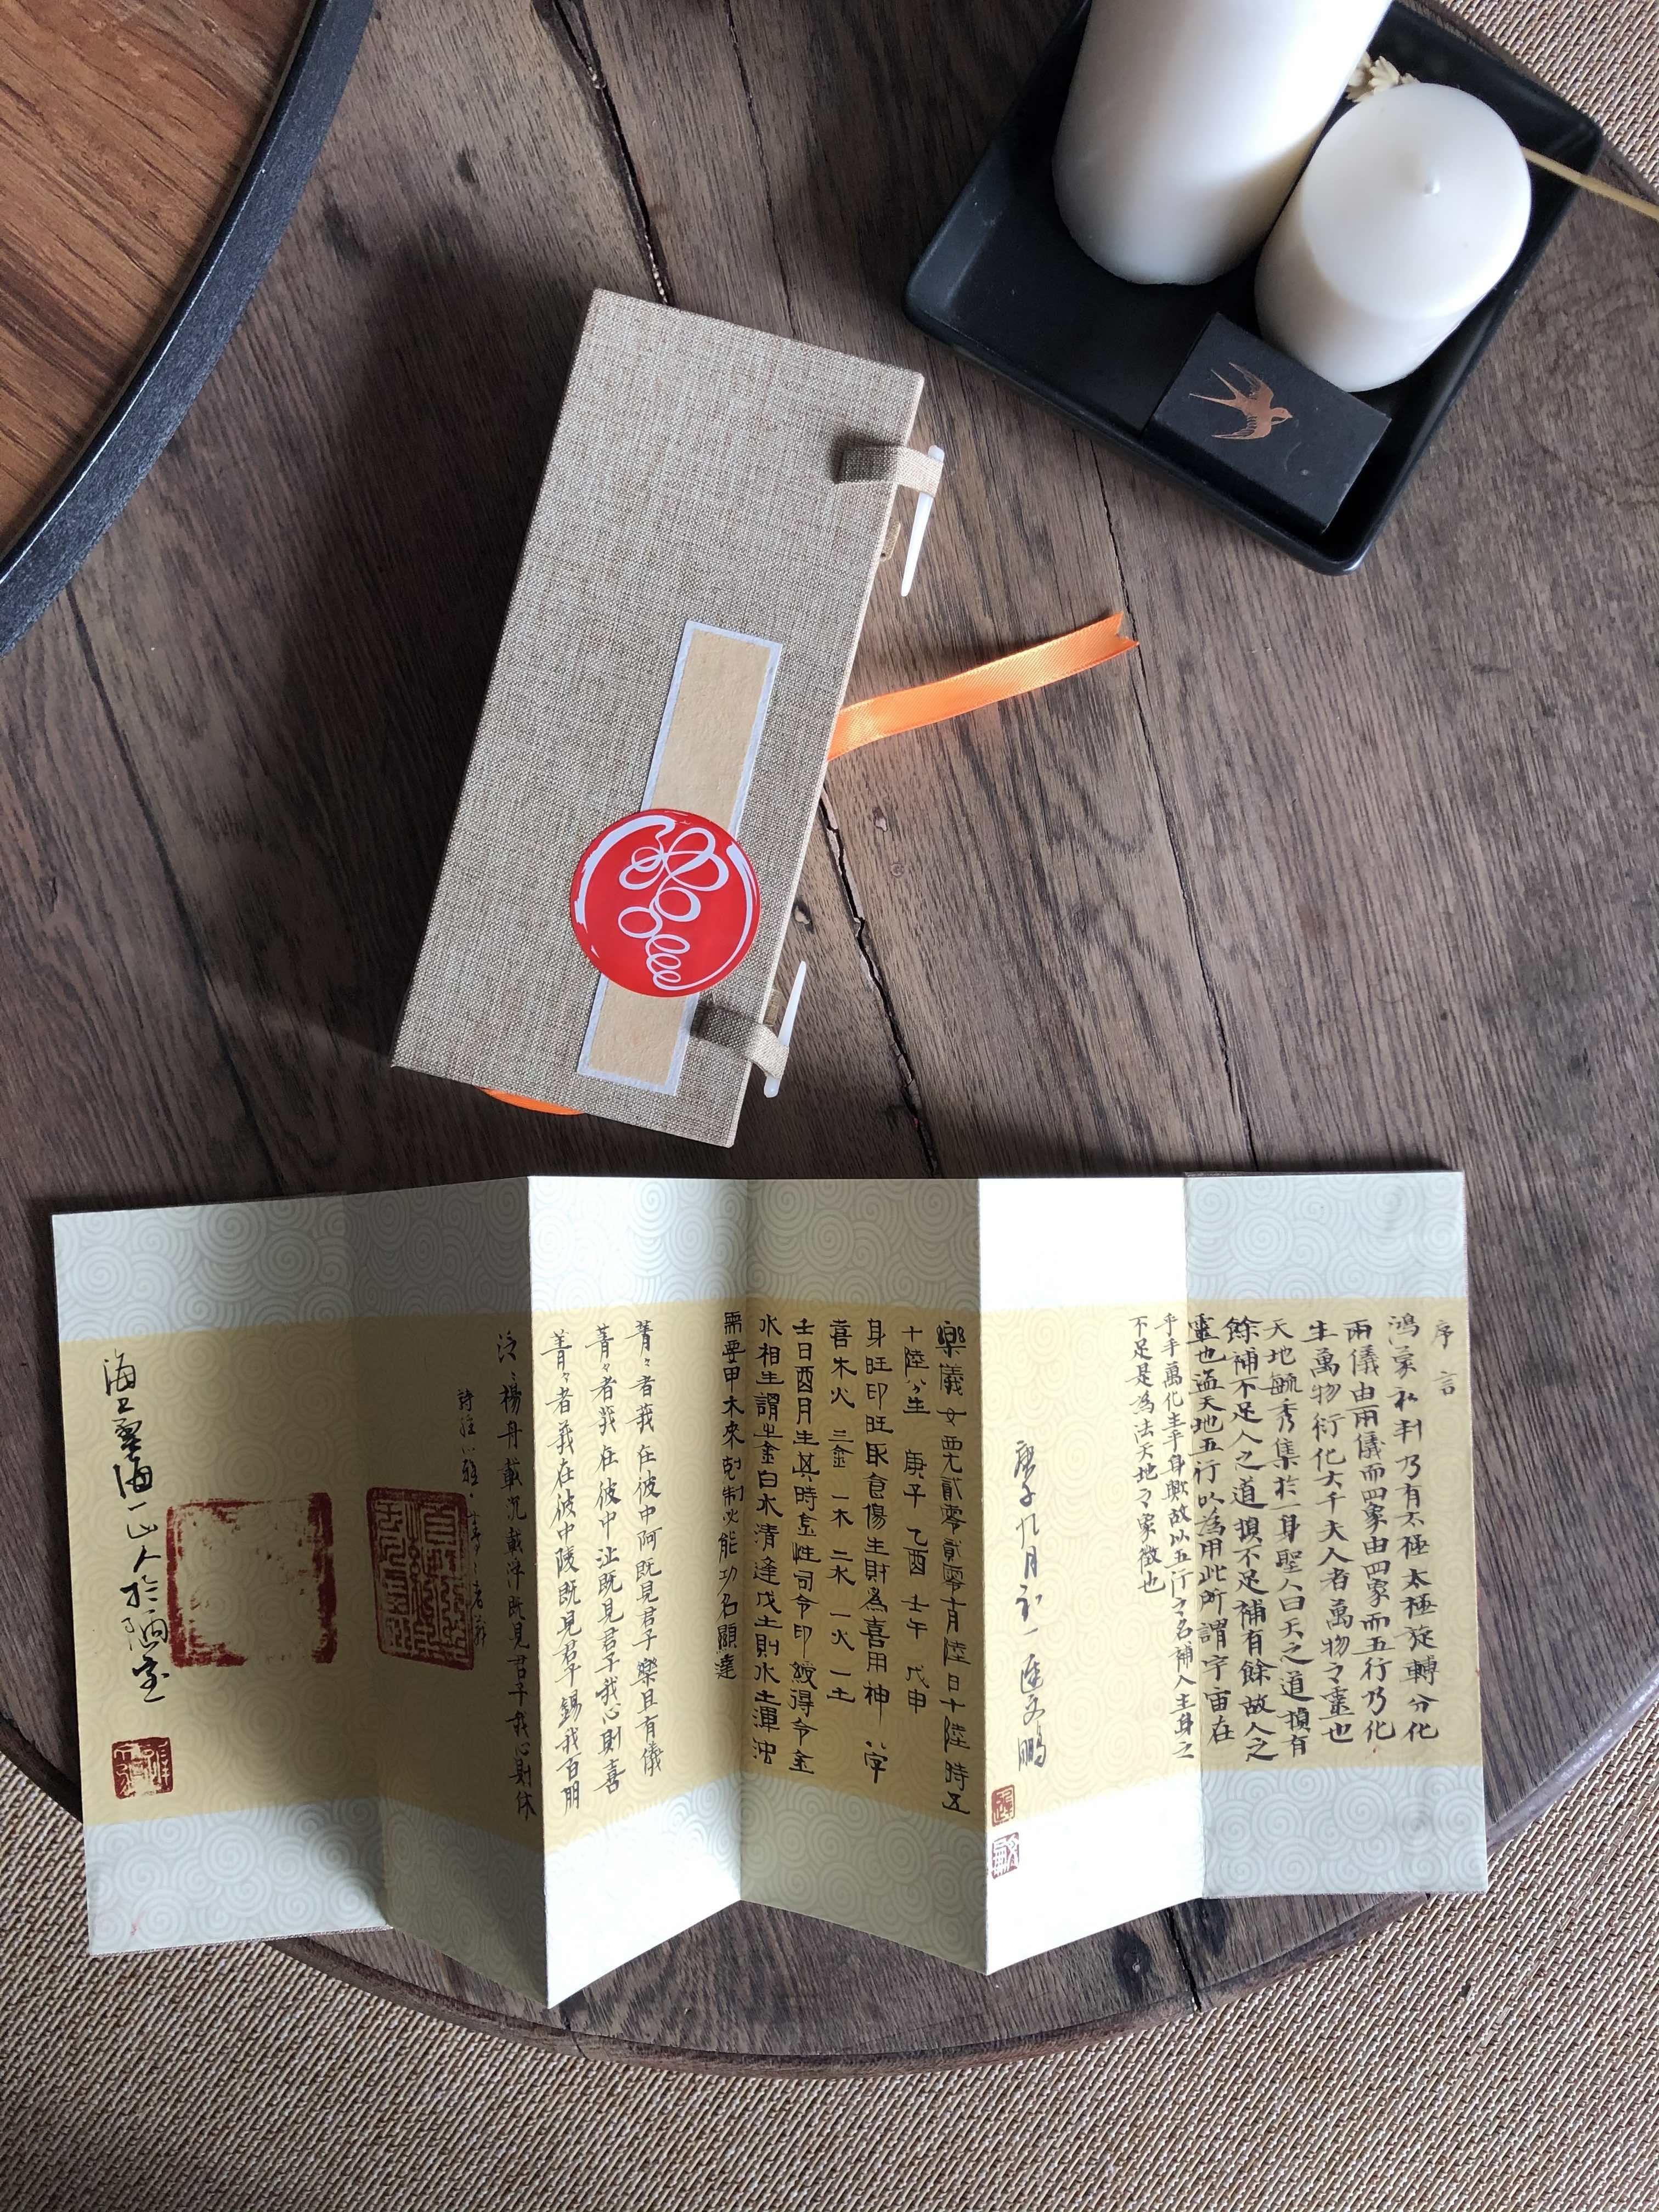 carnetsdeshanghai.com_caroline boudehen 6